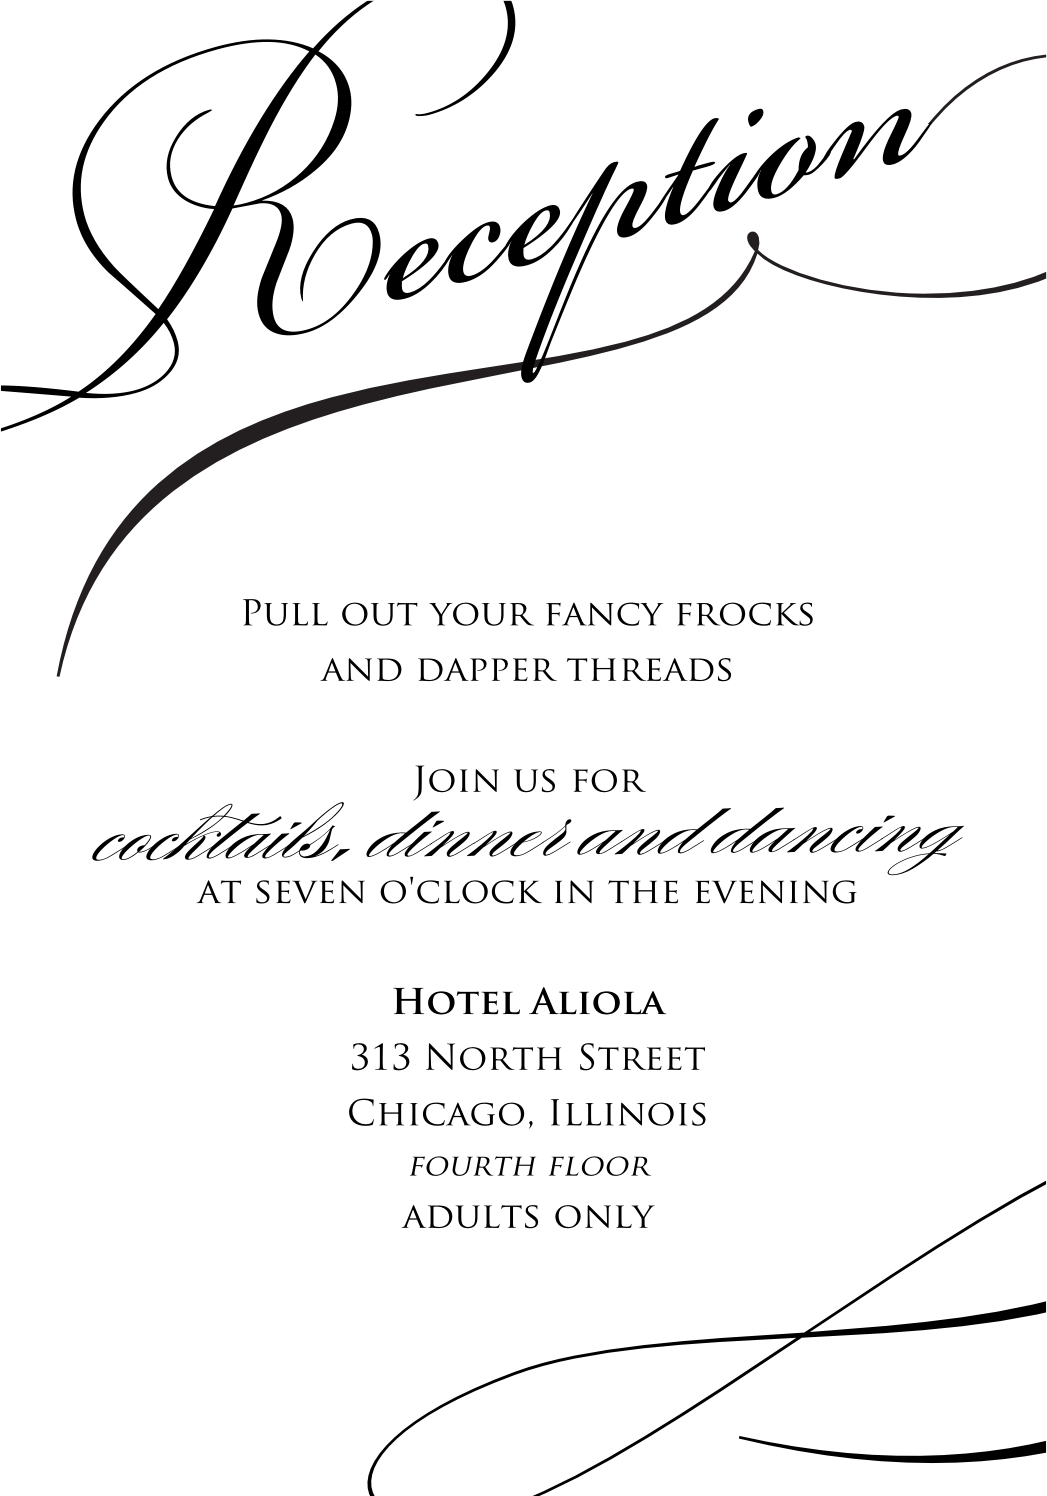 RECEPTION Amazing Stylish Black And White Wedding Reception Invitation Inspiration With Simple Words